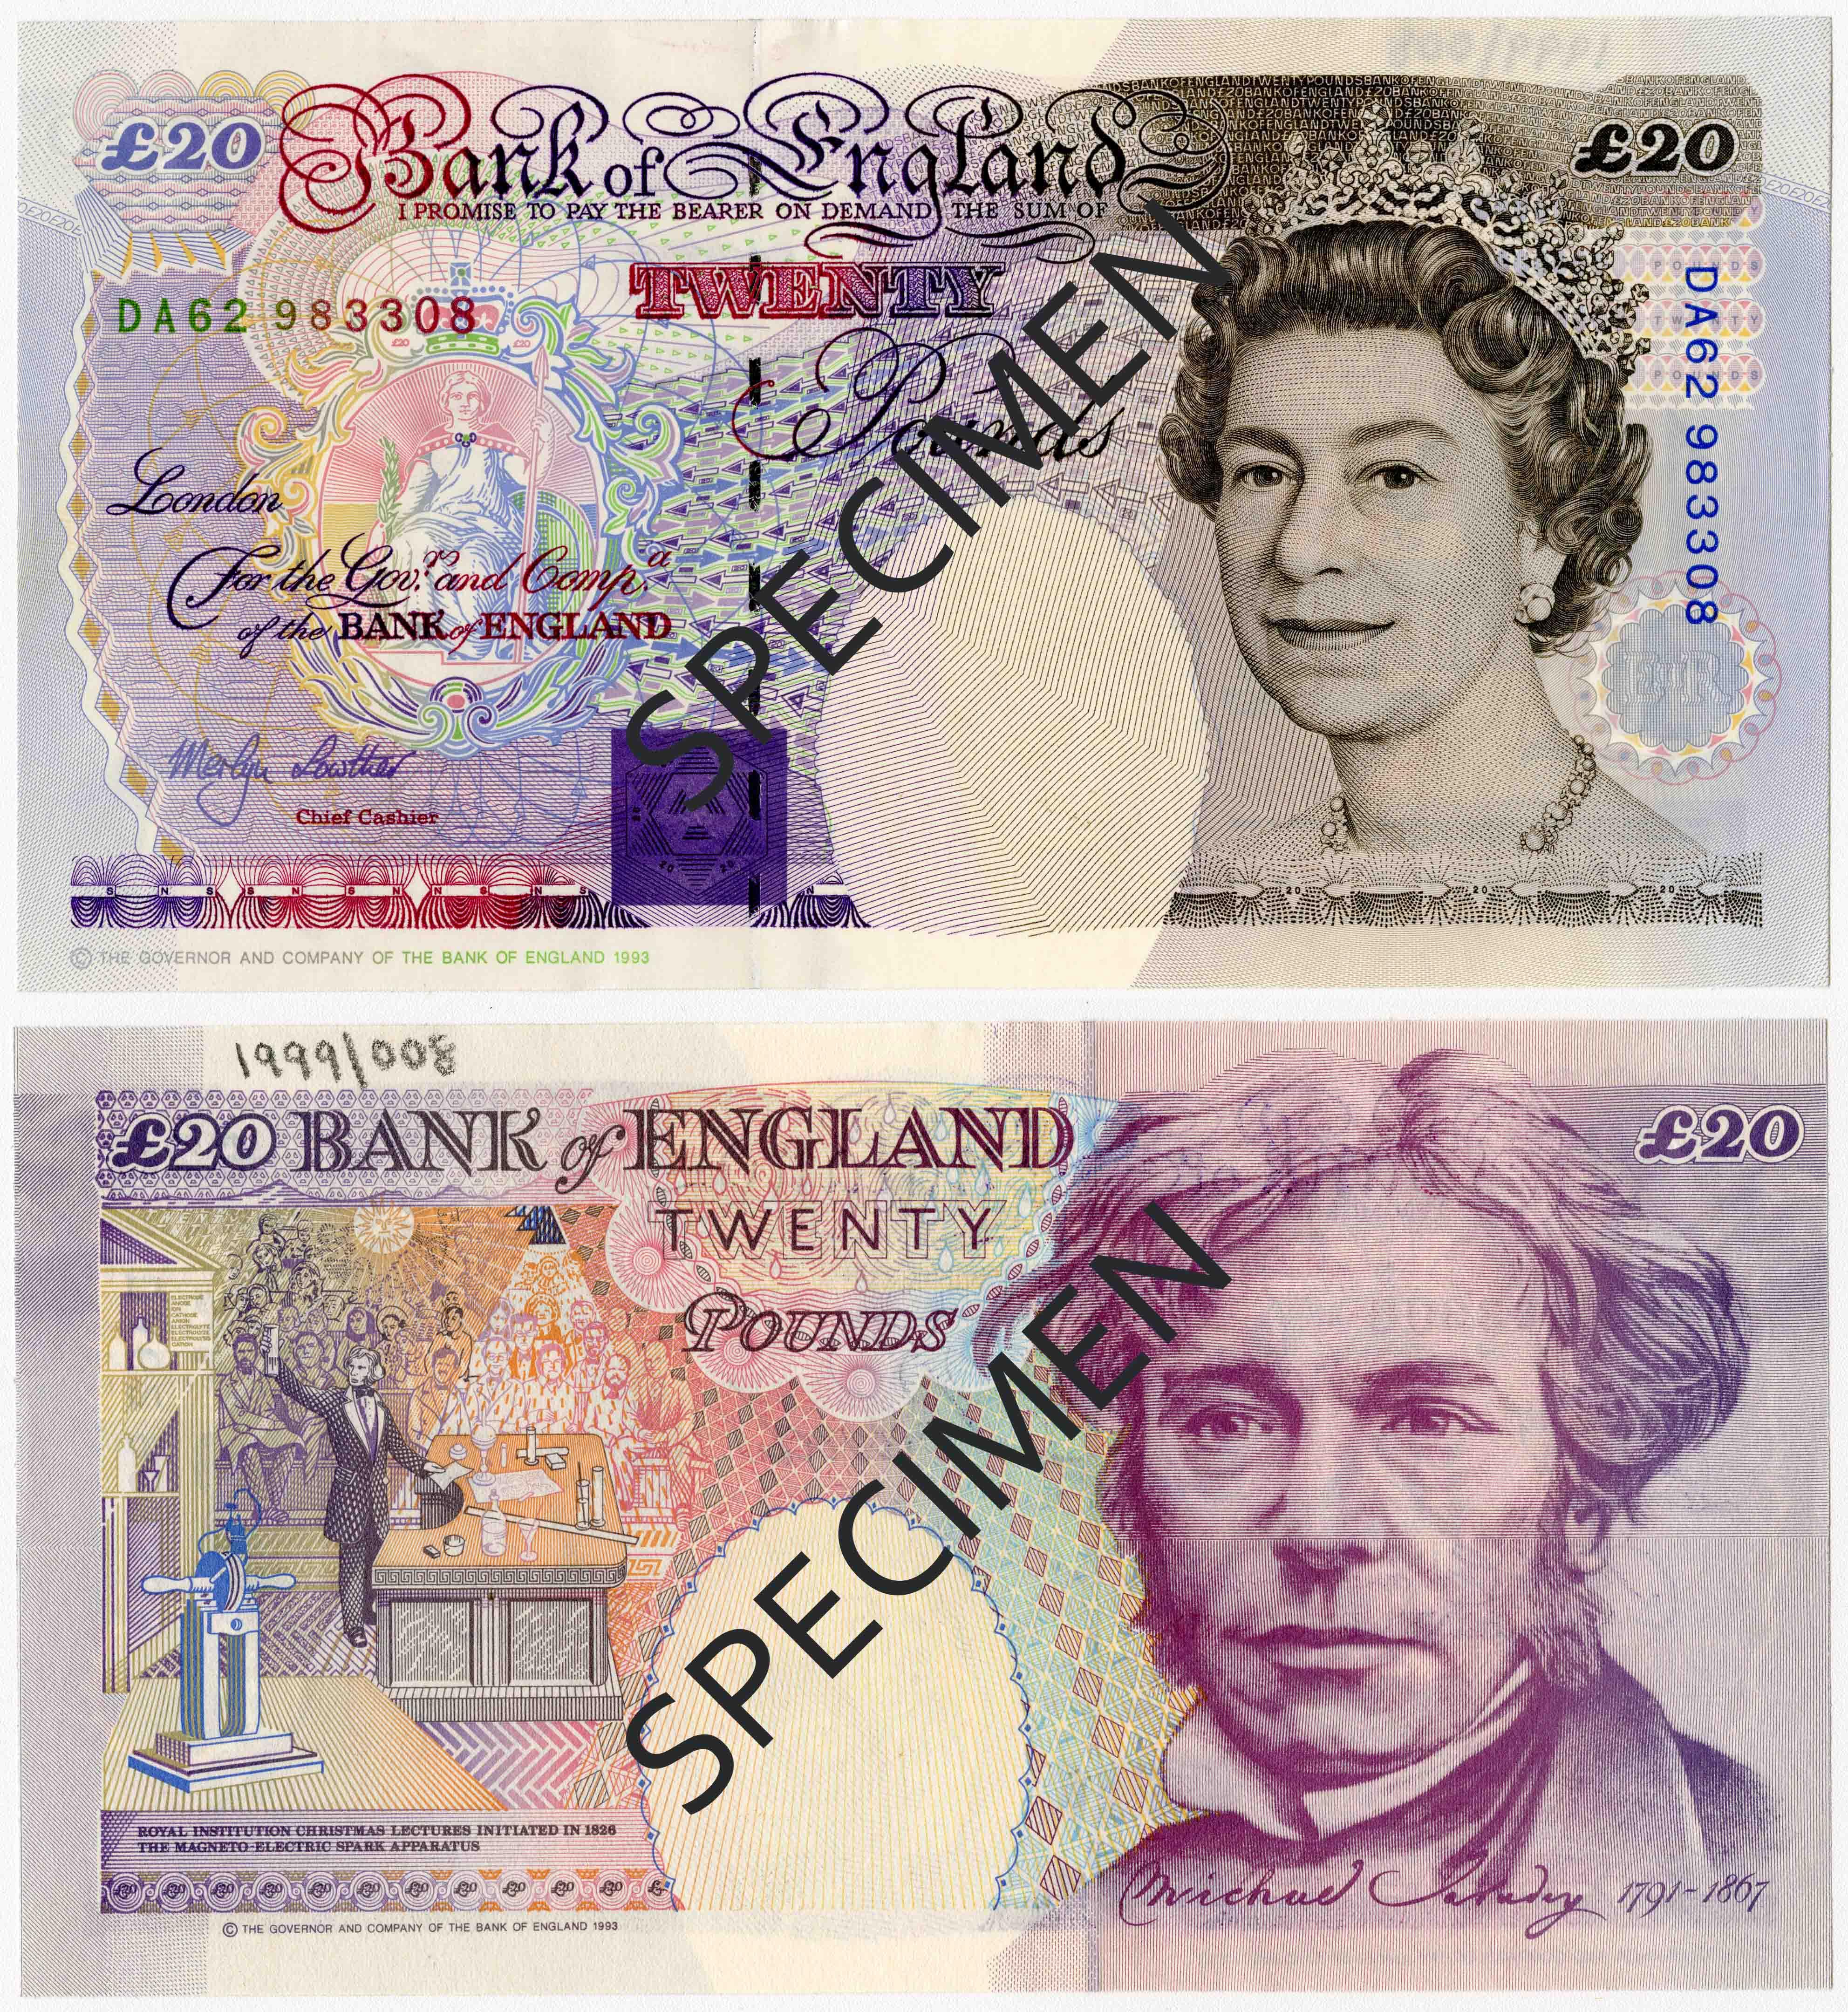 Michael Faraday £20 note